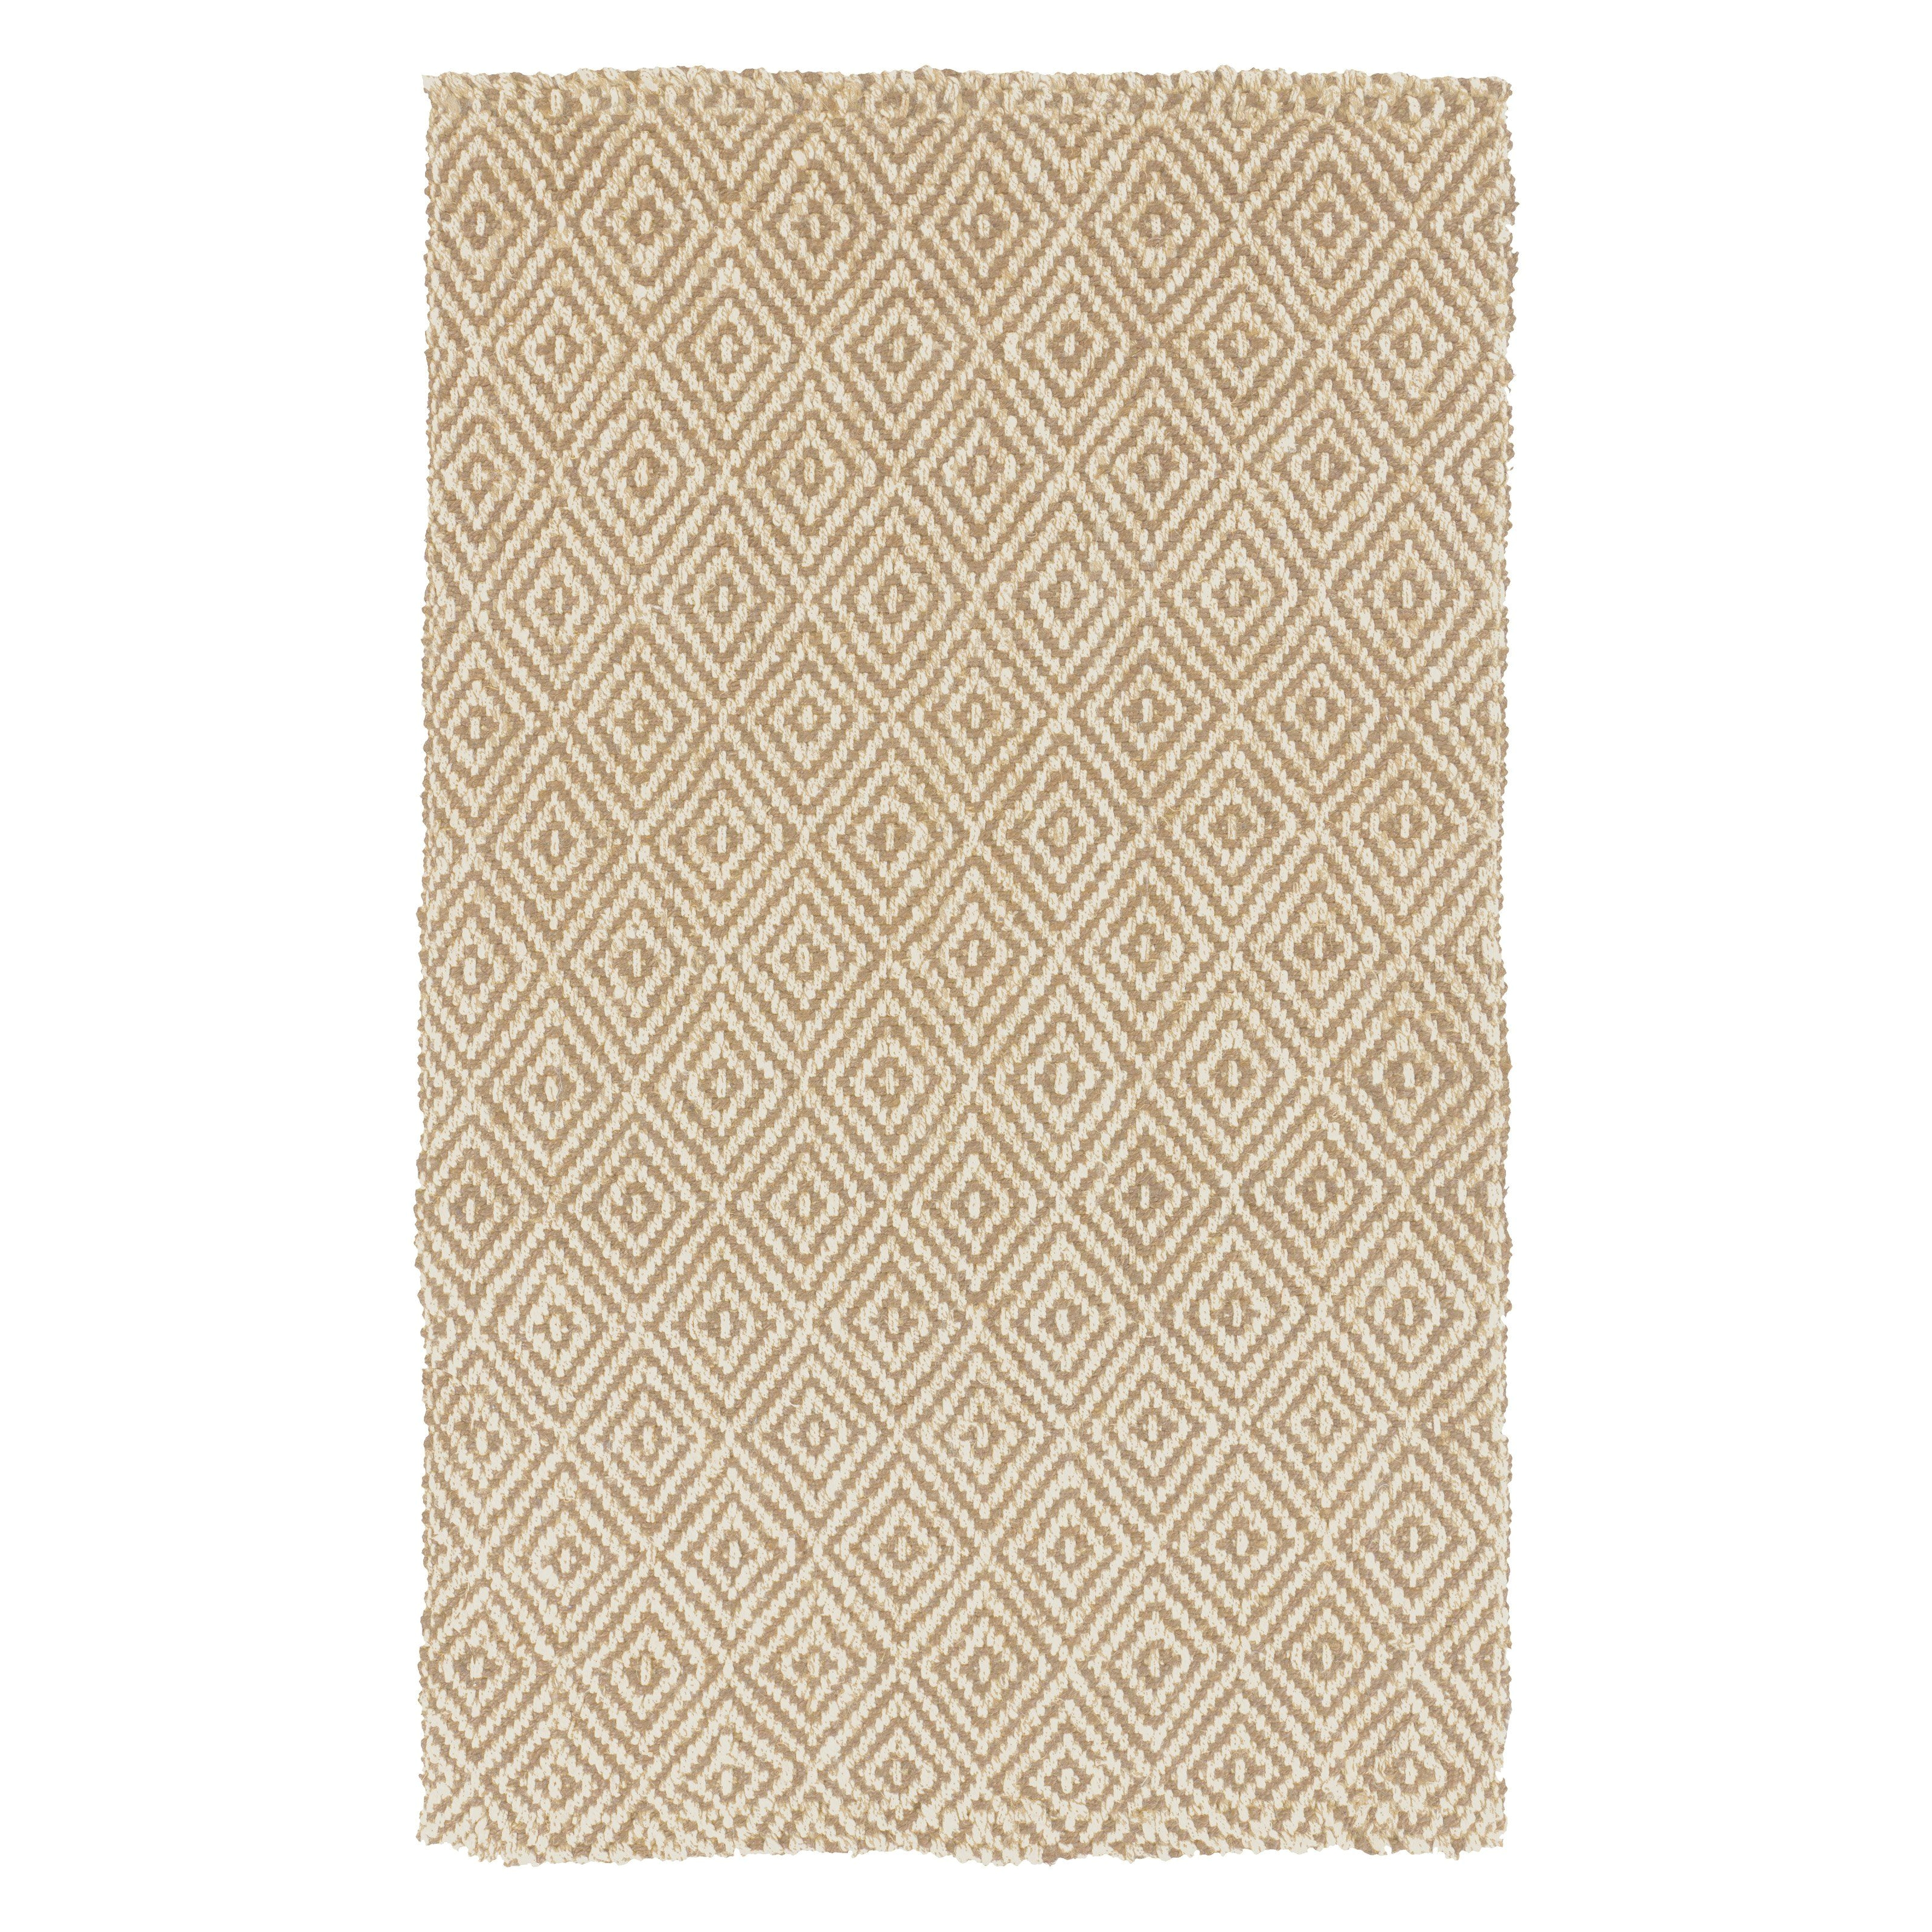 surya reed 8 natural fibers area rug reed806 23